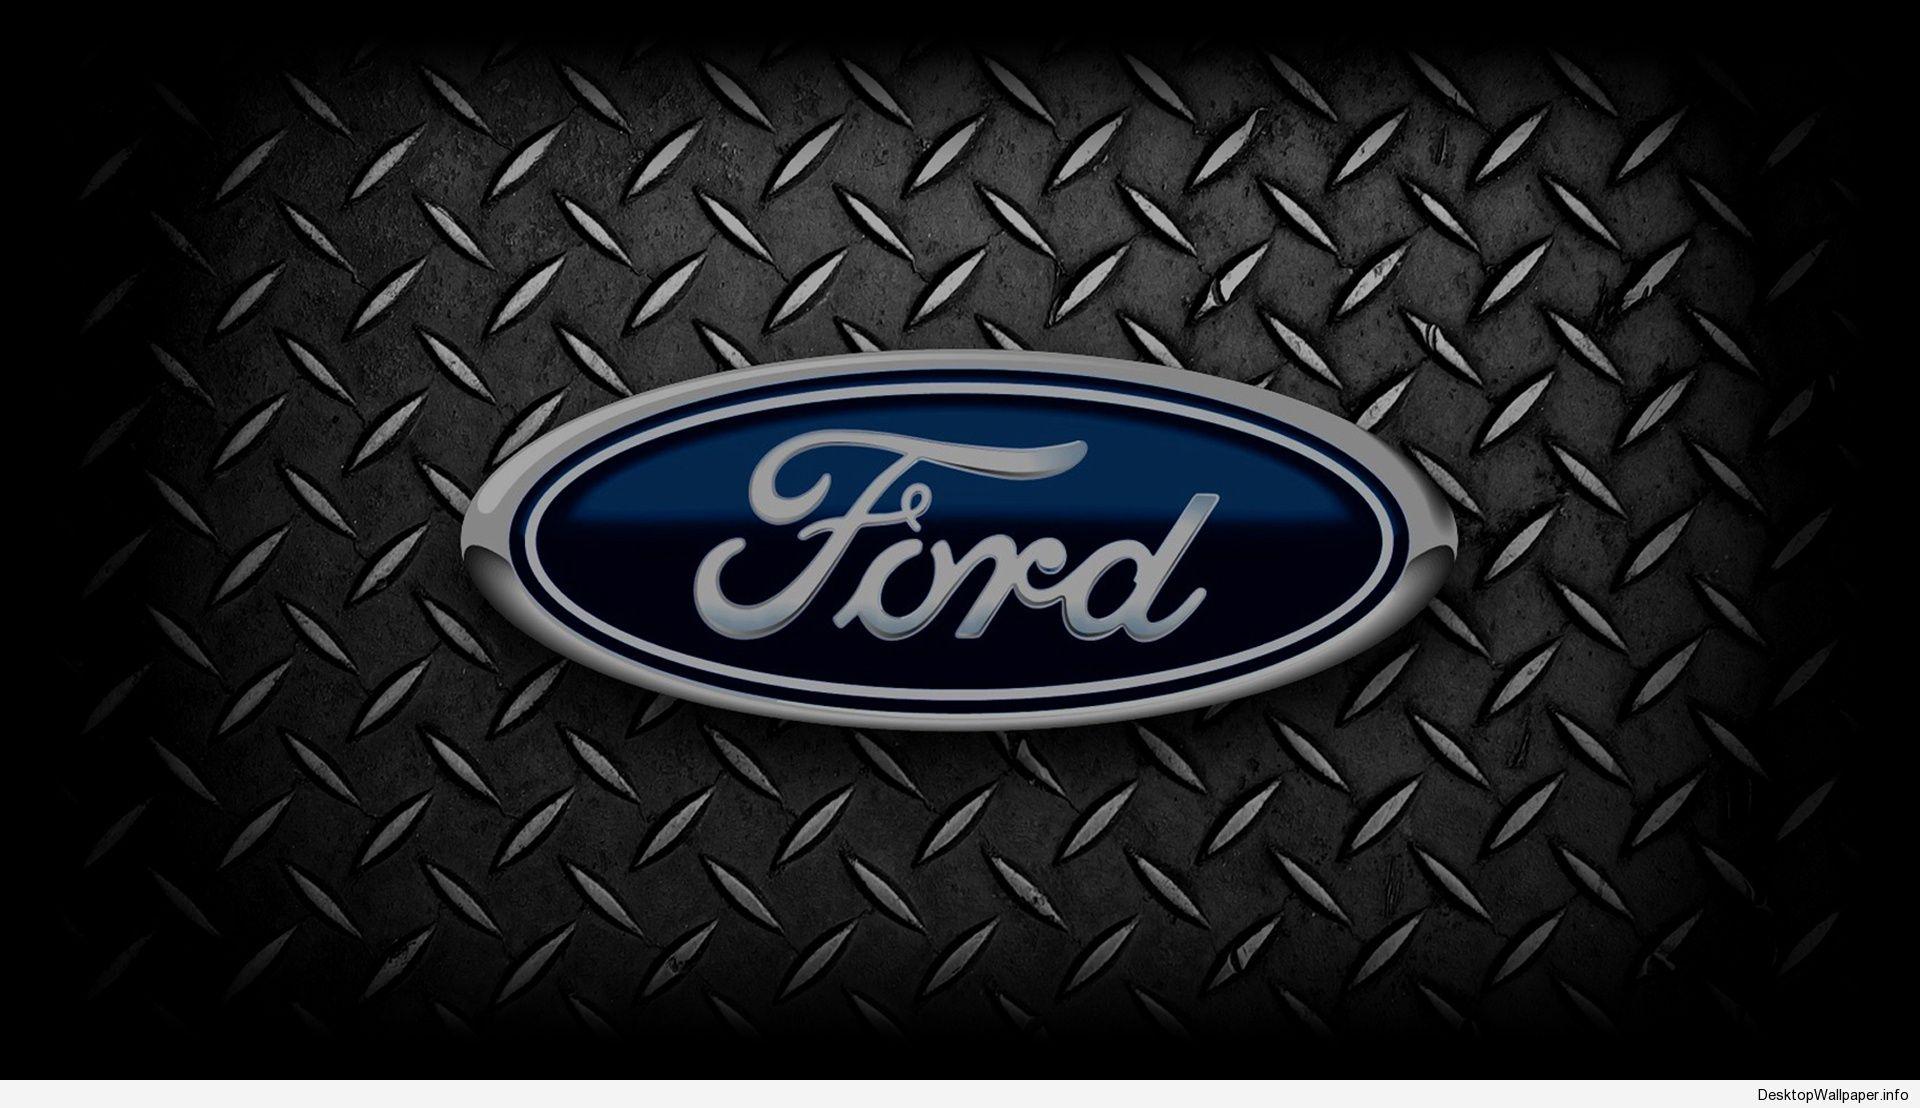 ford emblem wallpaper http//desktopwallpaper.info/ford